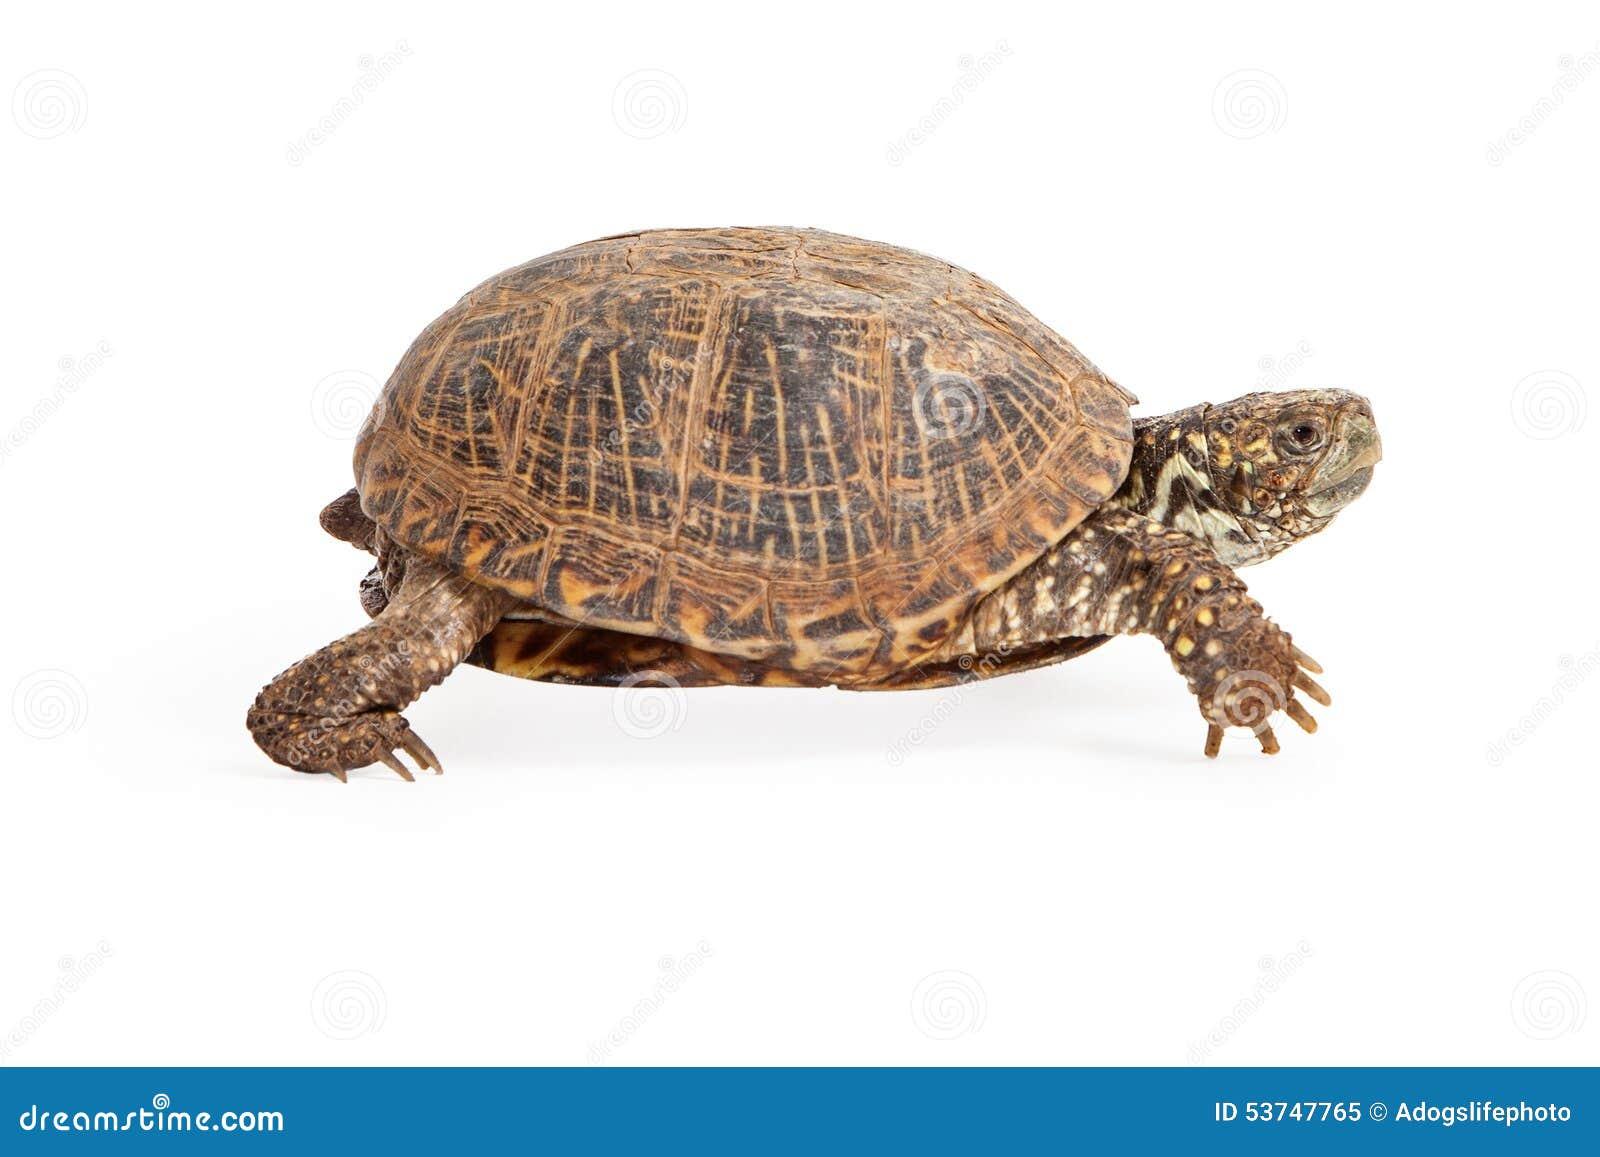 box turtle walking side view stock image image of states